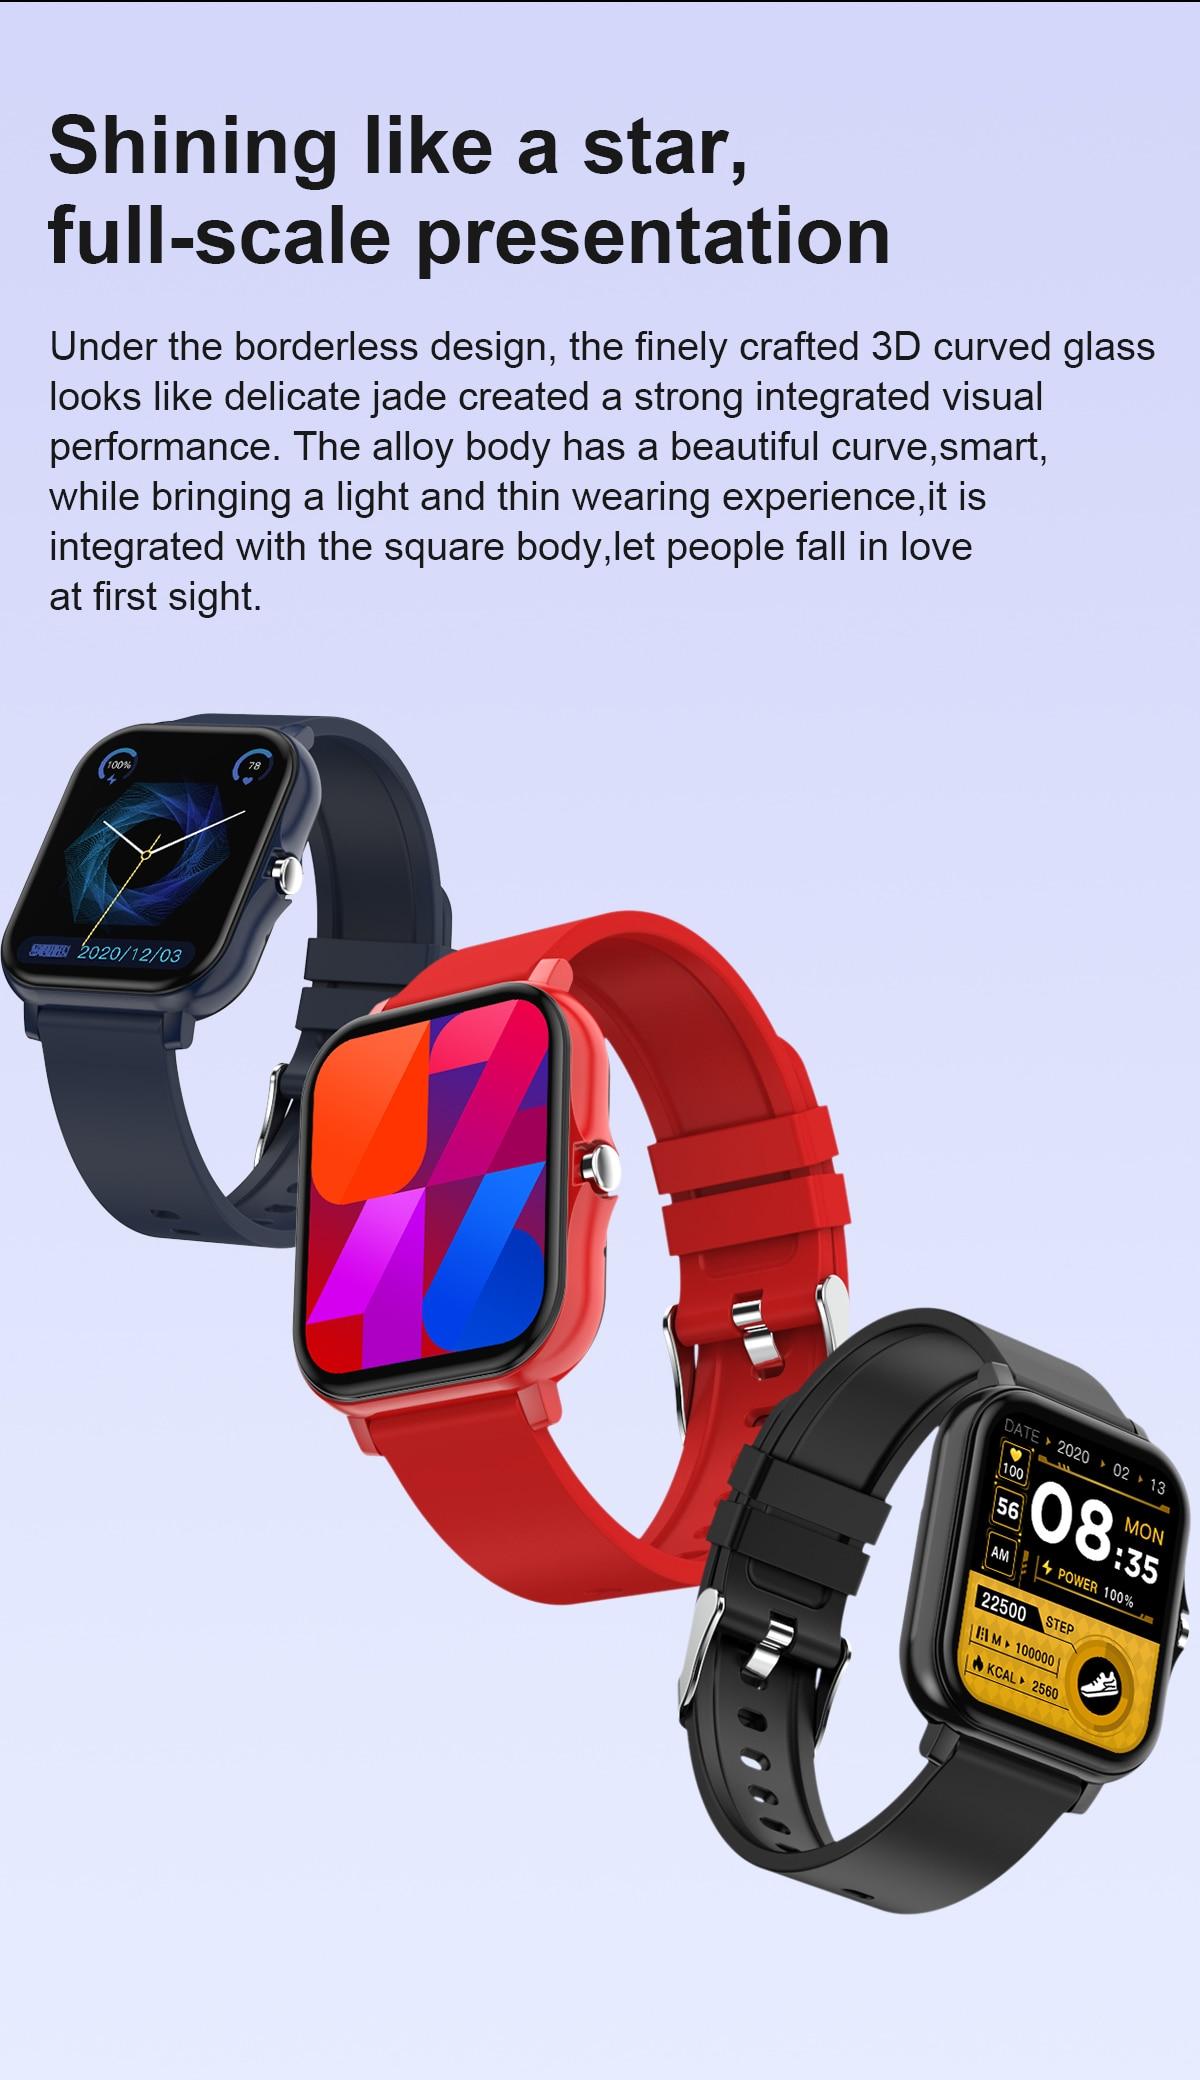 Inteligente watchfitness trackerblood pressuresmartatcheswaterproof monitorbluetooth freqüência cardíaca